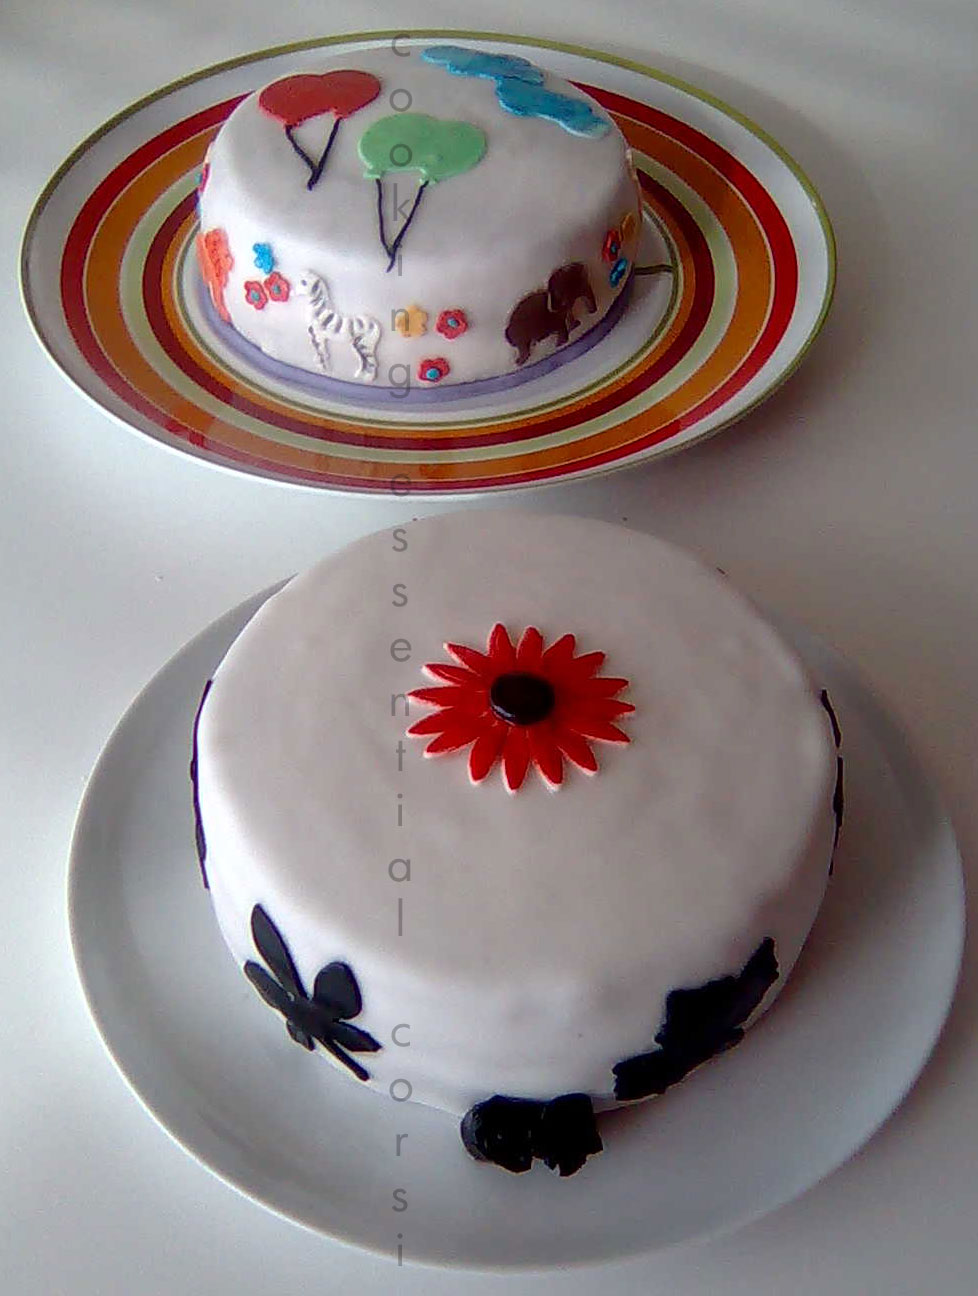 Cooking Essential: I Corsi di Cake Design